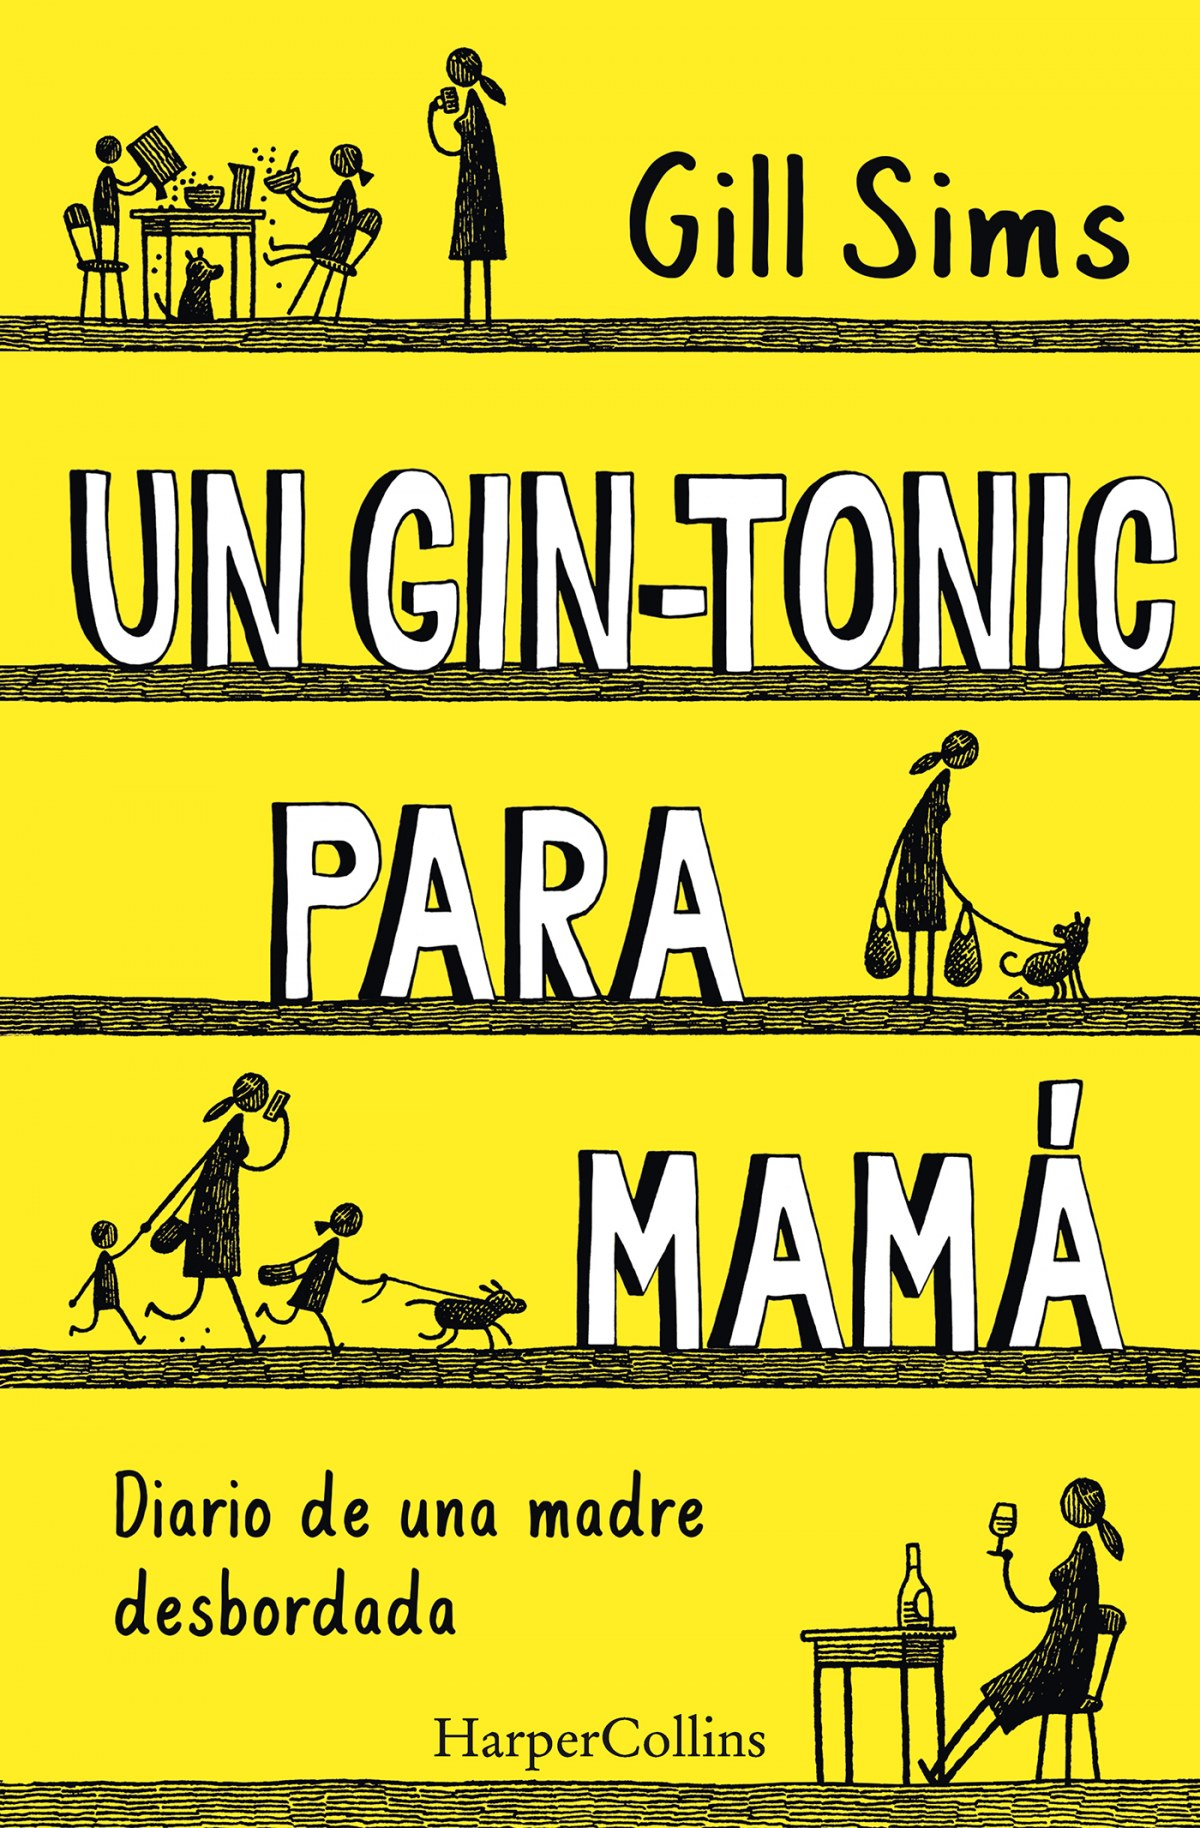 UN GIN-TONIC PARA MAMÁ 9788491393498